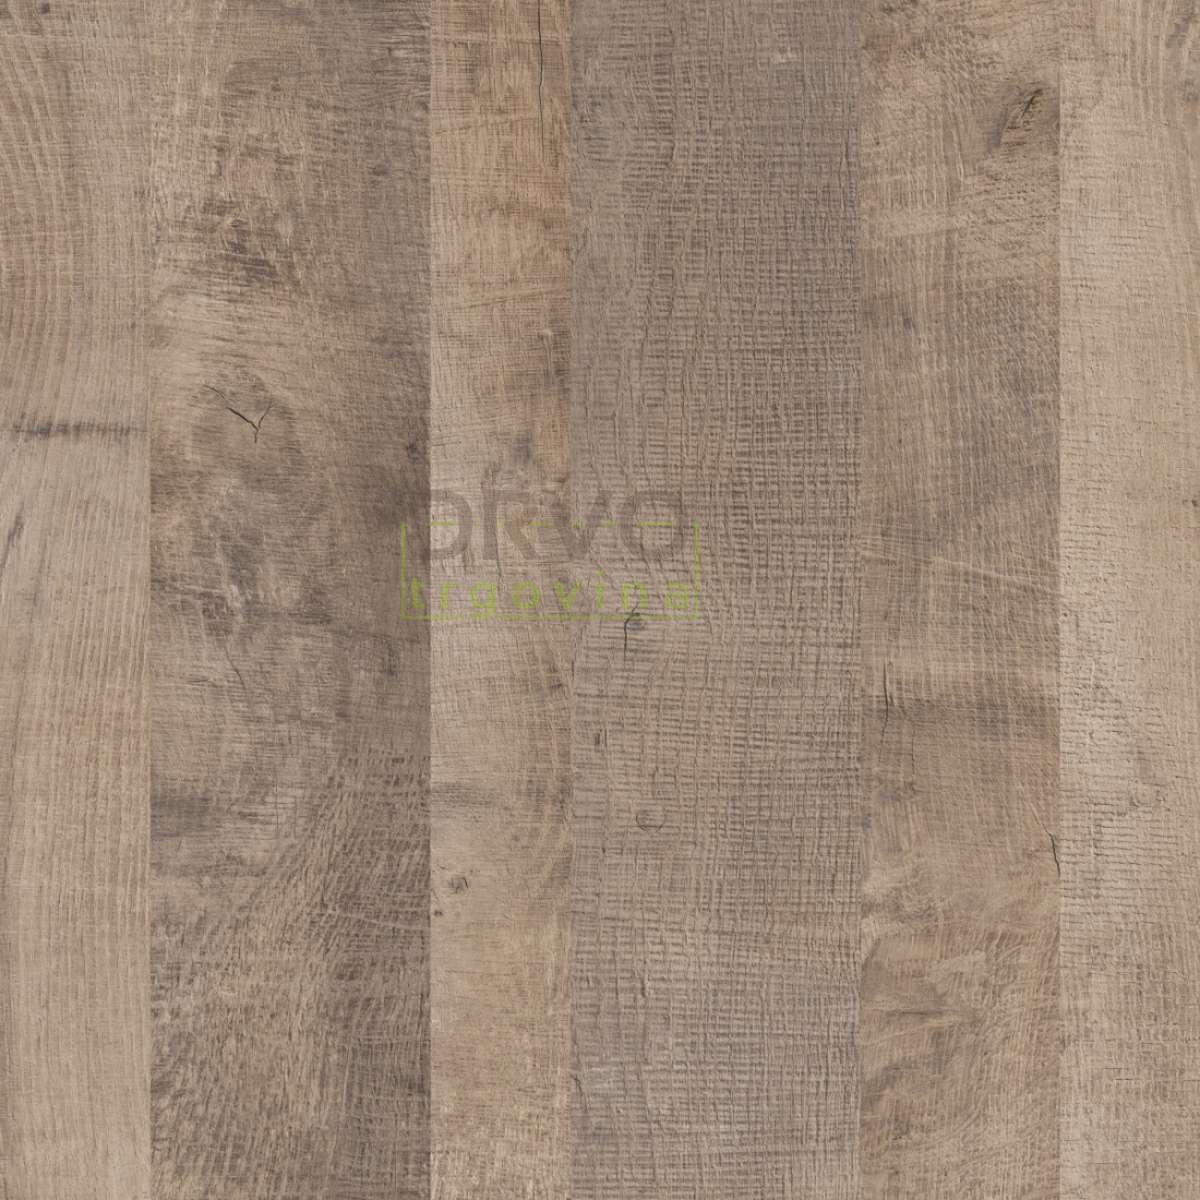 IVERICA OPLEMENJENA K356 PW HRAST SAND GRANGE 18mm 2800/2070